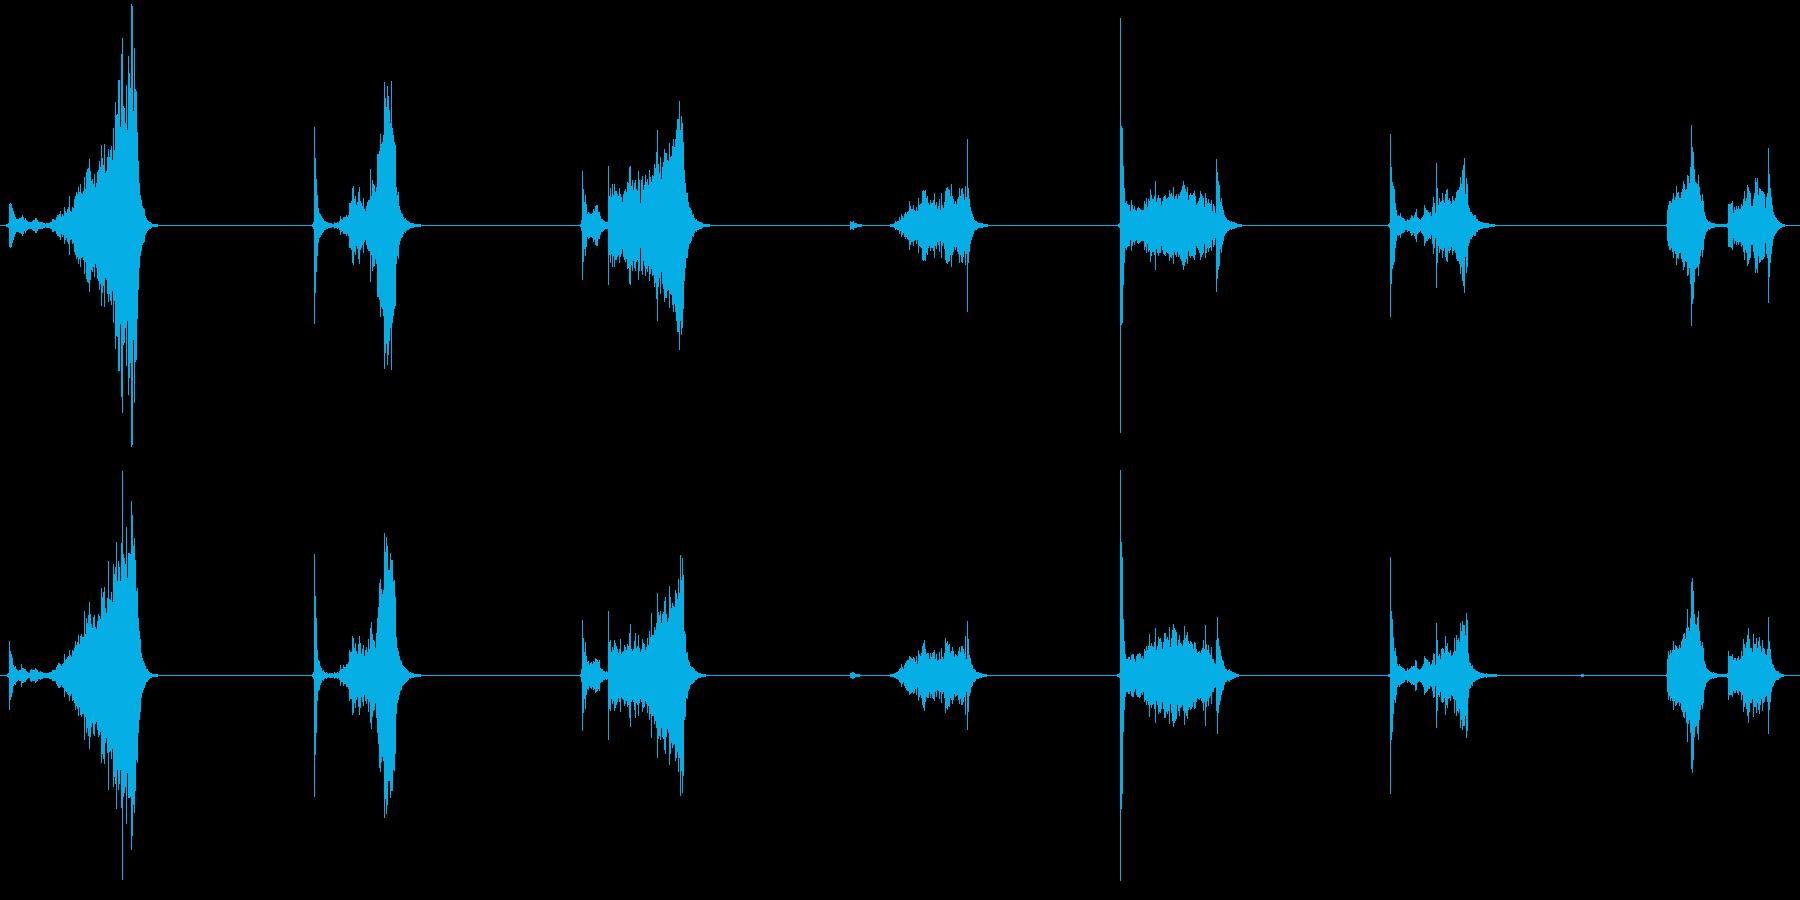 ASMR ナイフを擦る音の再生済みの波形